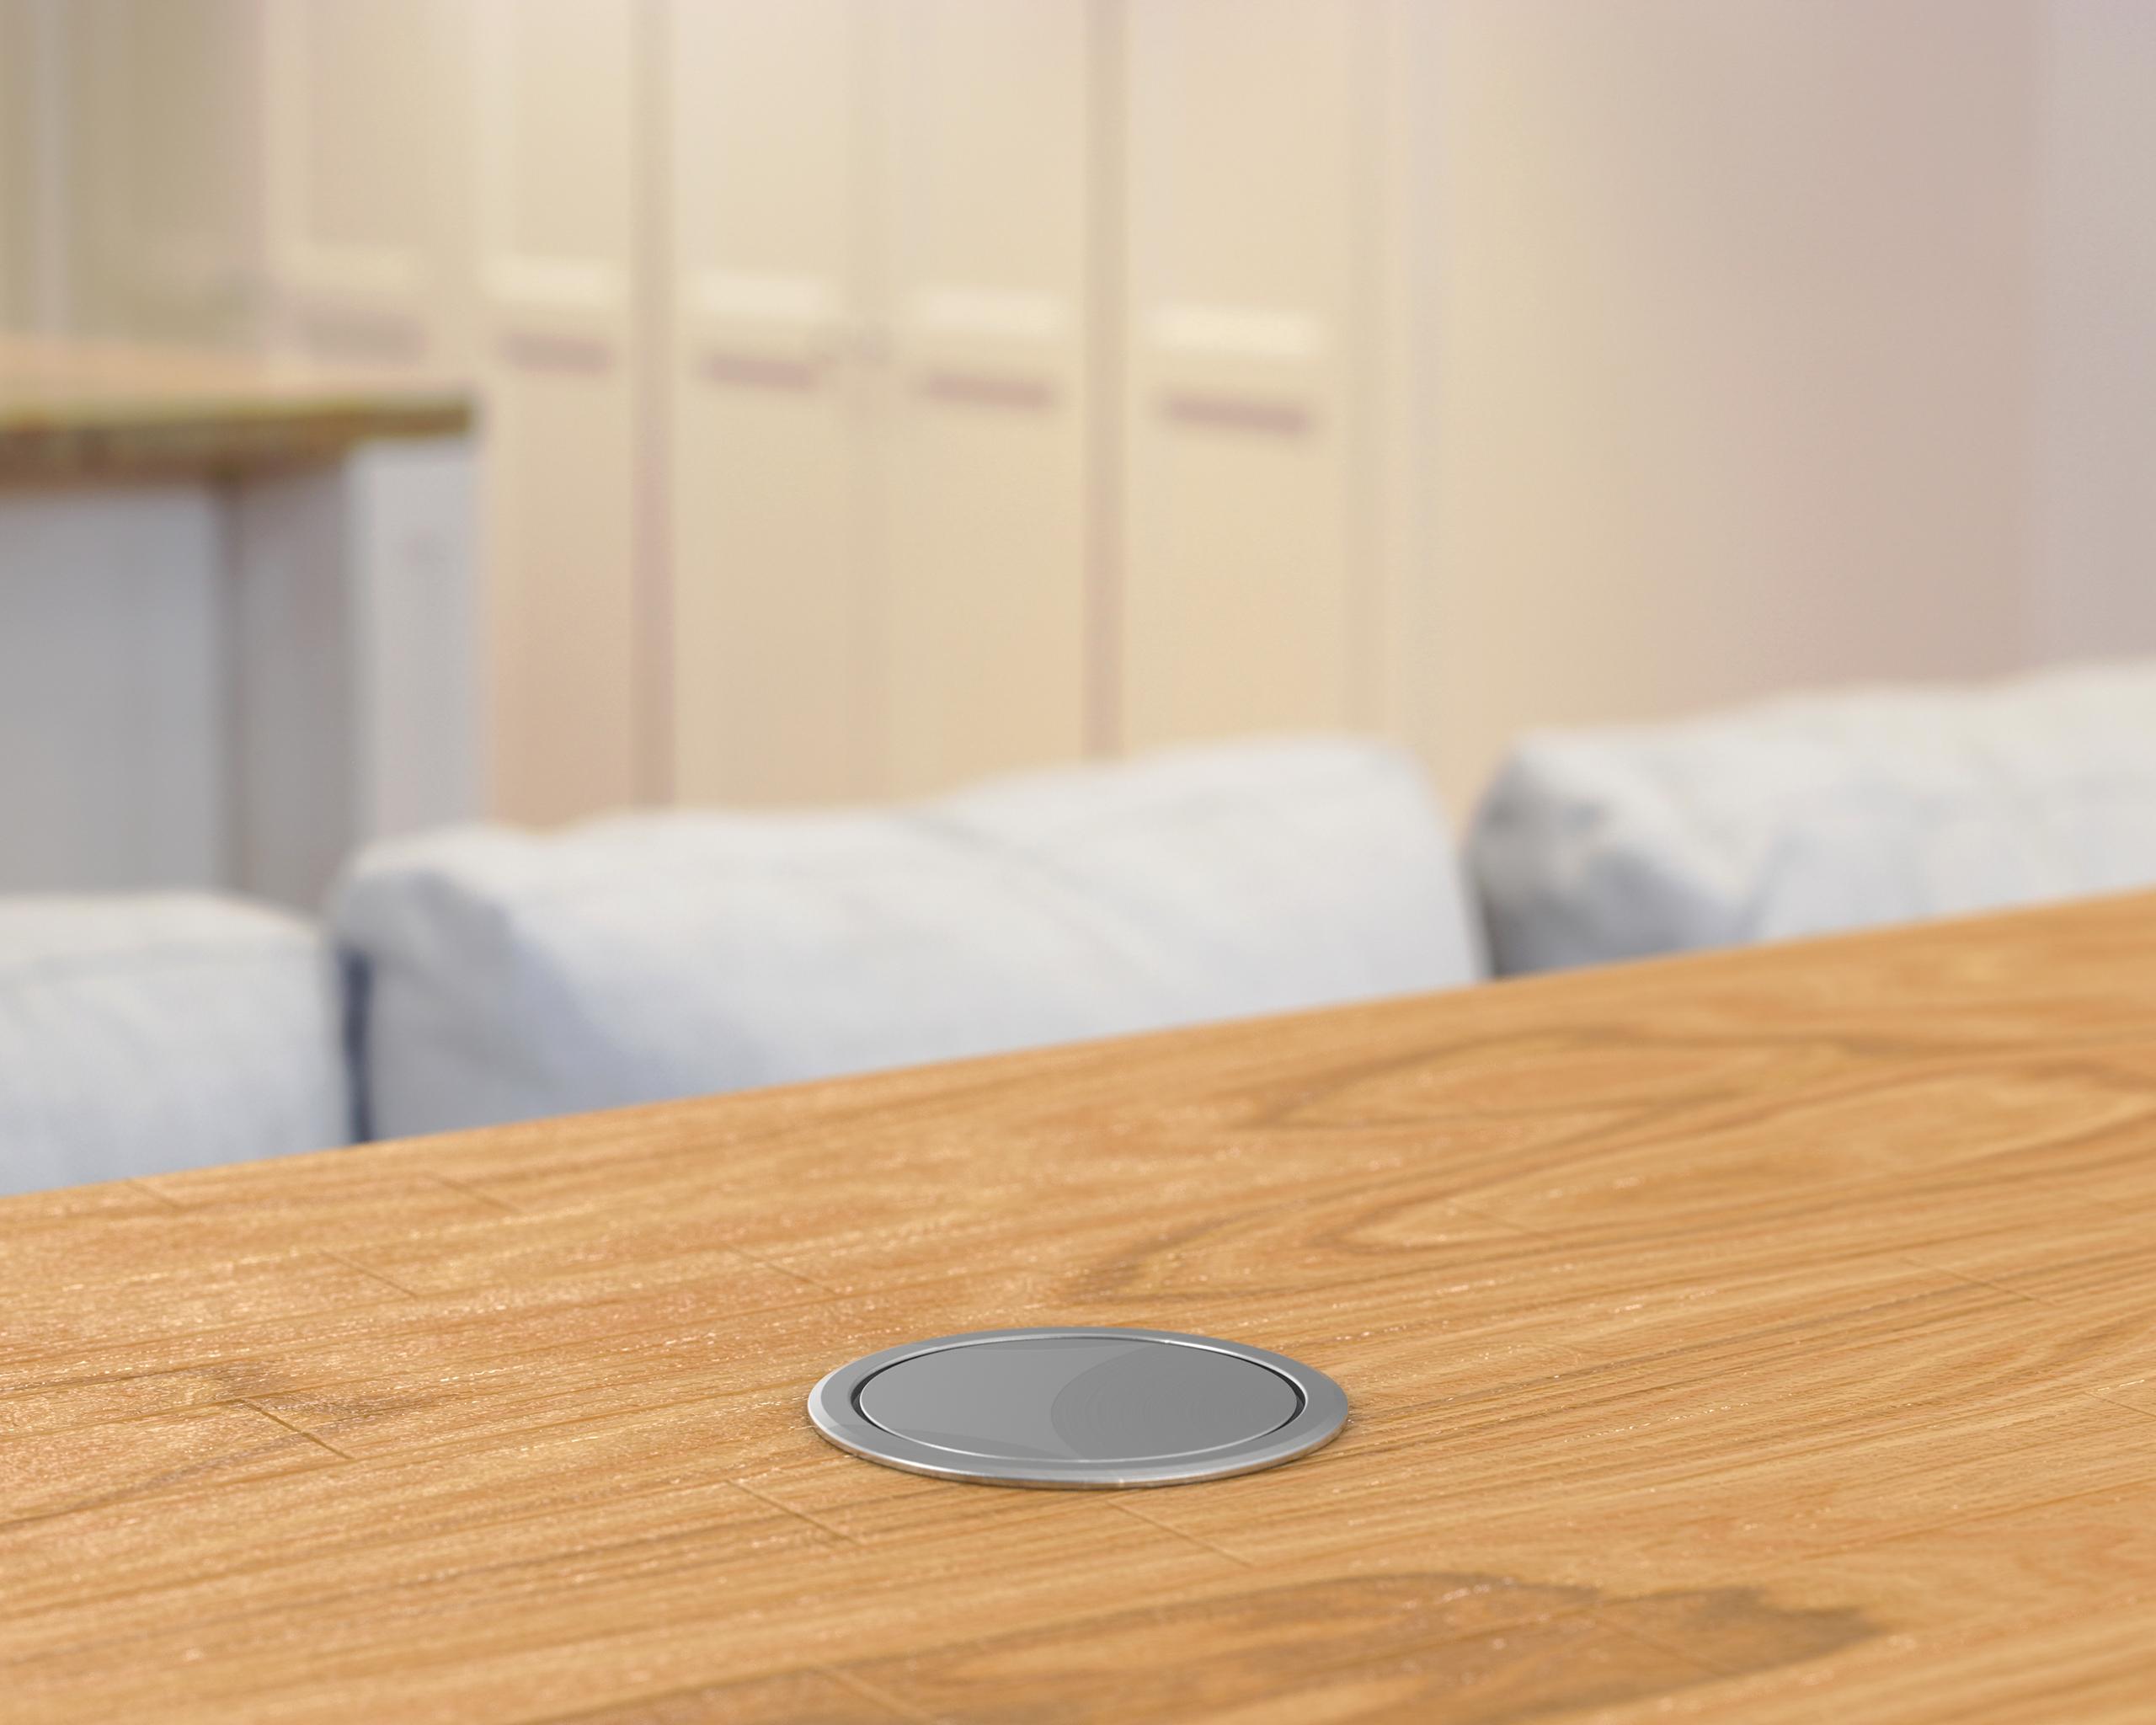 Marvelous V2Gssb Us Stainless Steel Black Pop Up Power Outlet W Usb Inzonedesignstudio Interior Chair Design Inzonedesignstudiocom